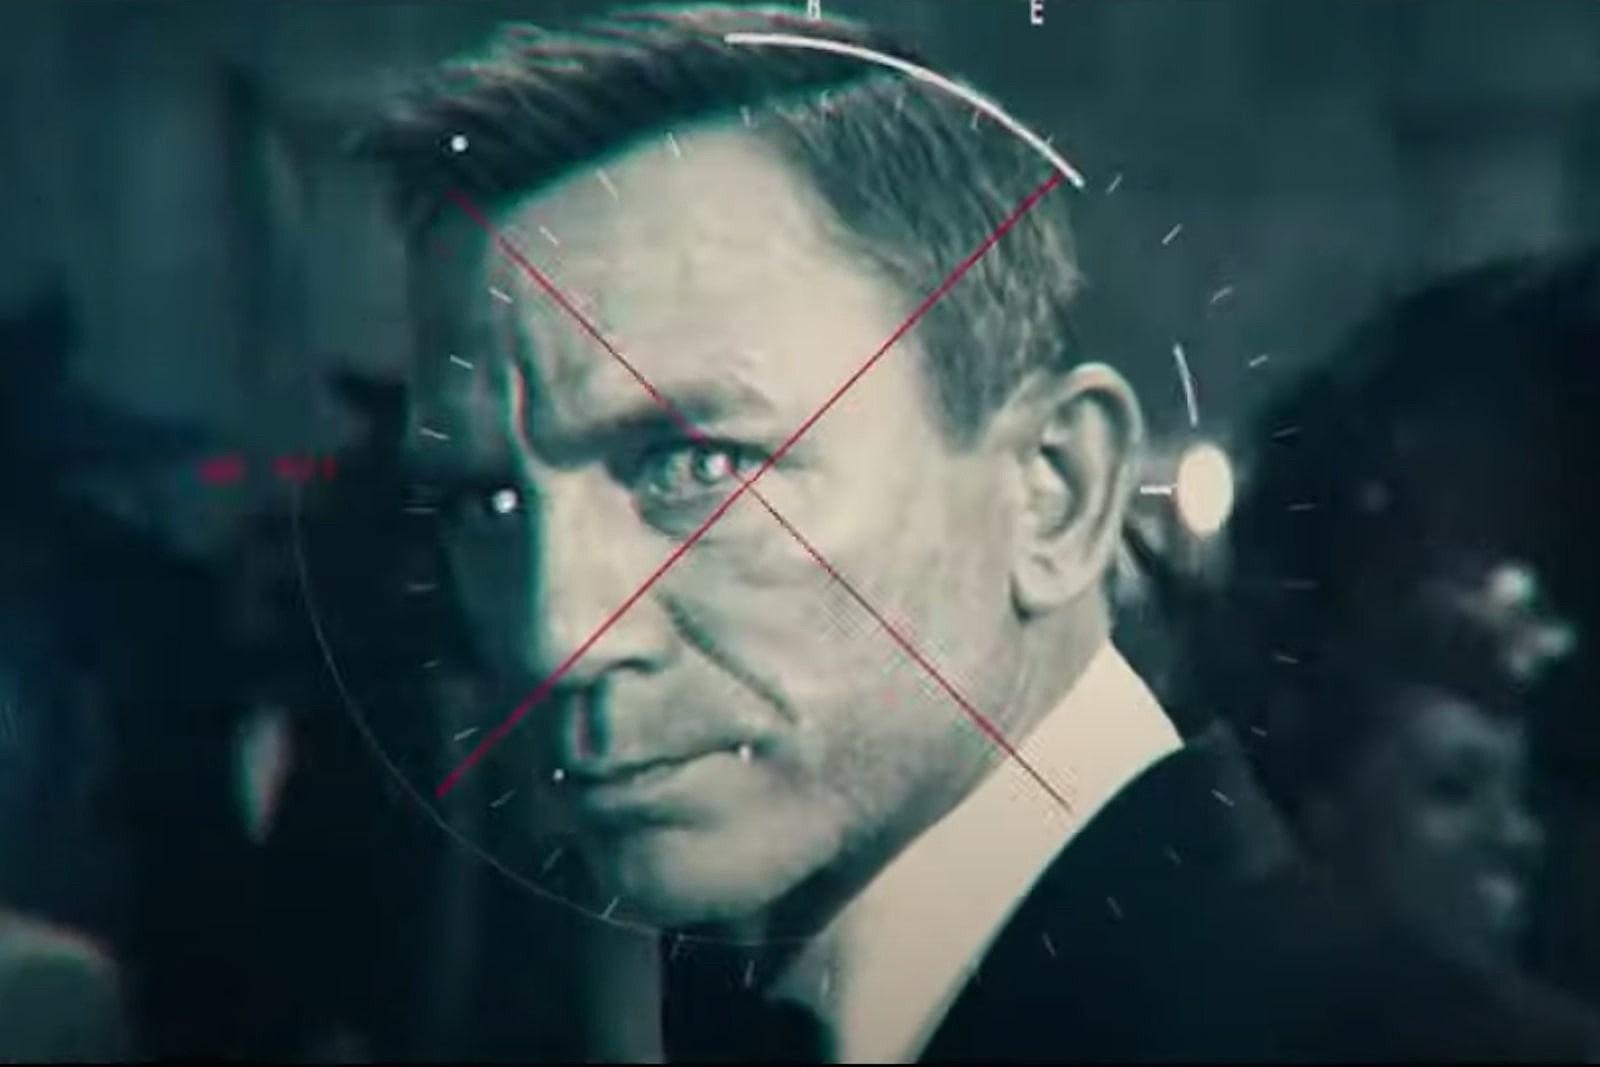 Watch New James Bond 'No Time to Die' Trailer